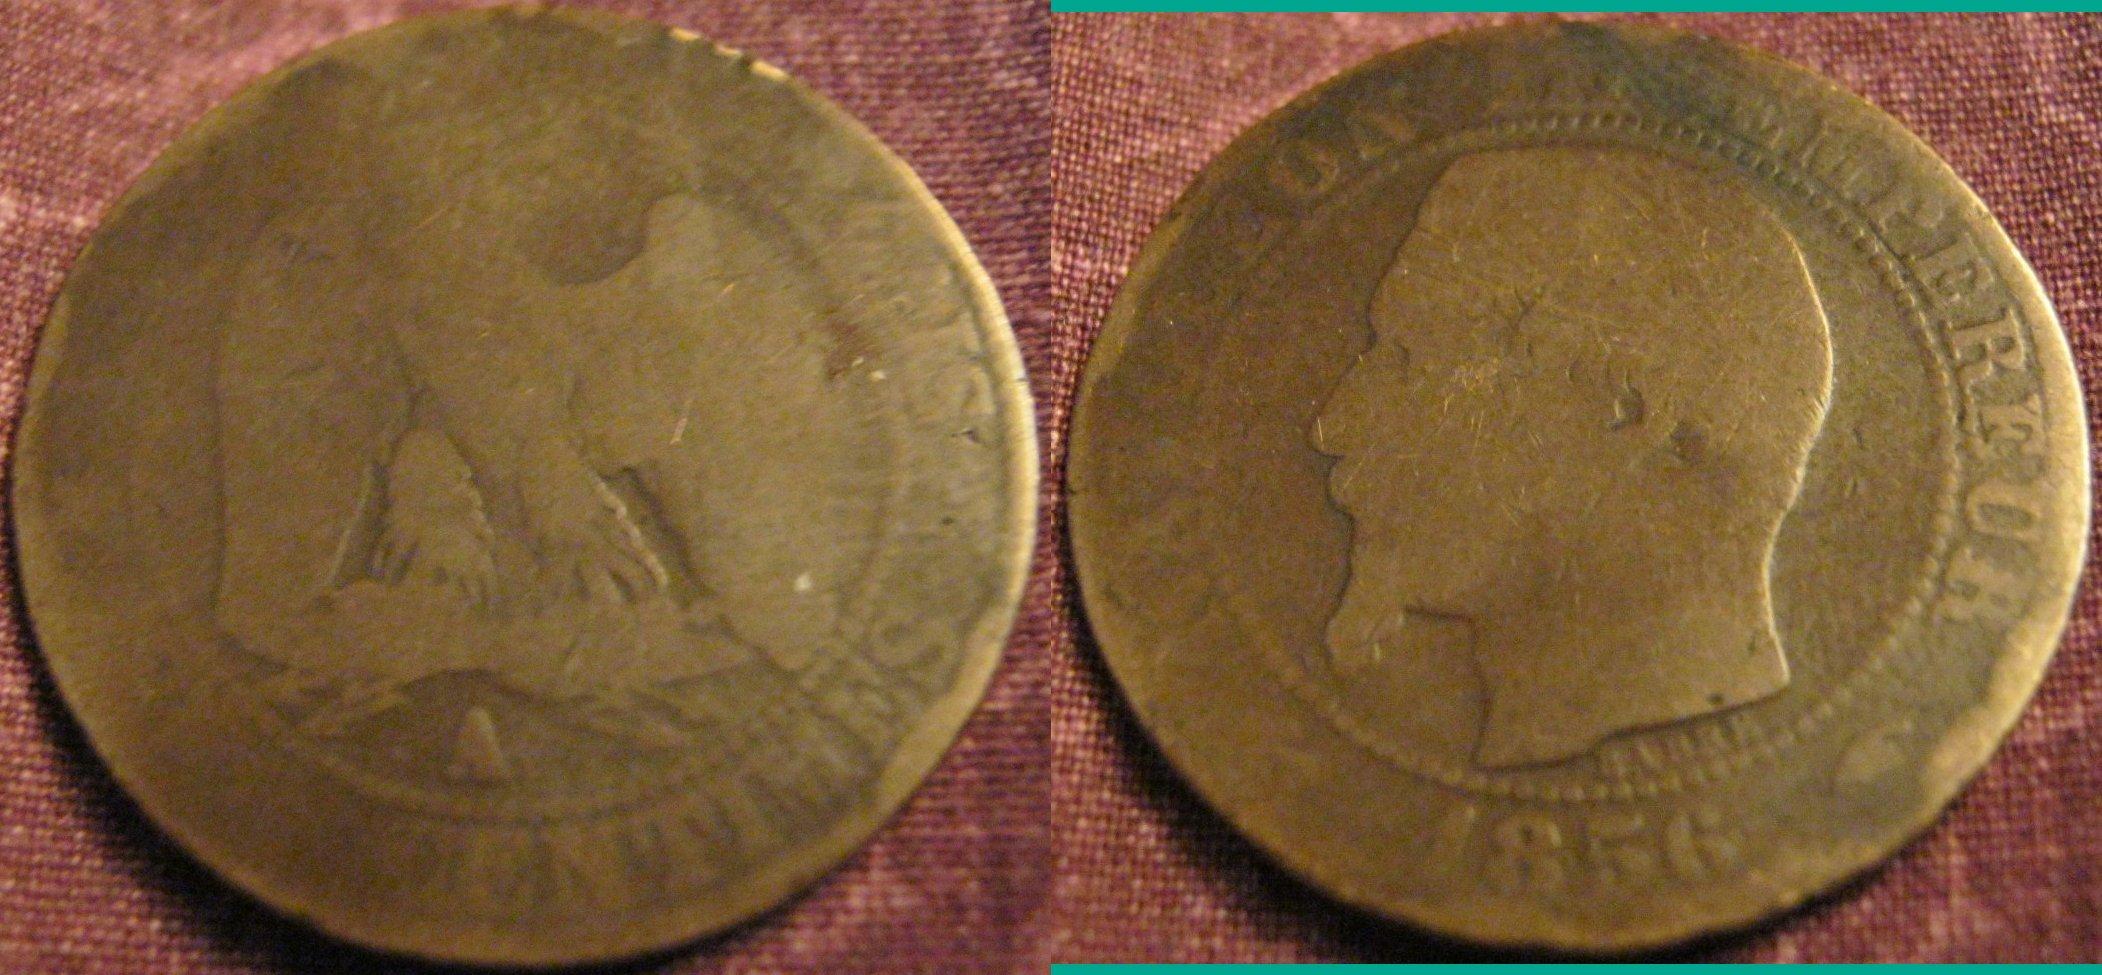 Napoleon III Empereur Coin 1856 by darkawaii on DeviantArt